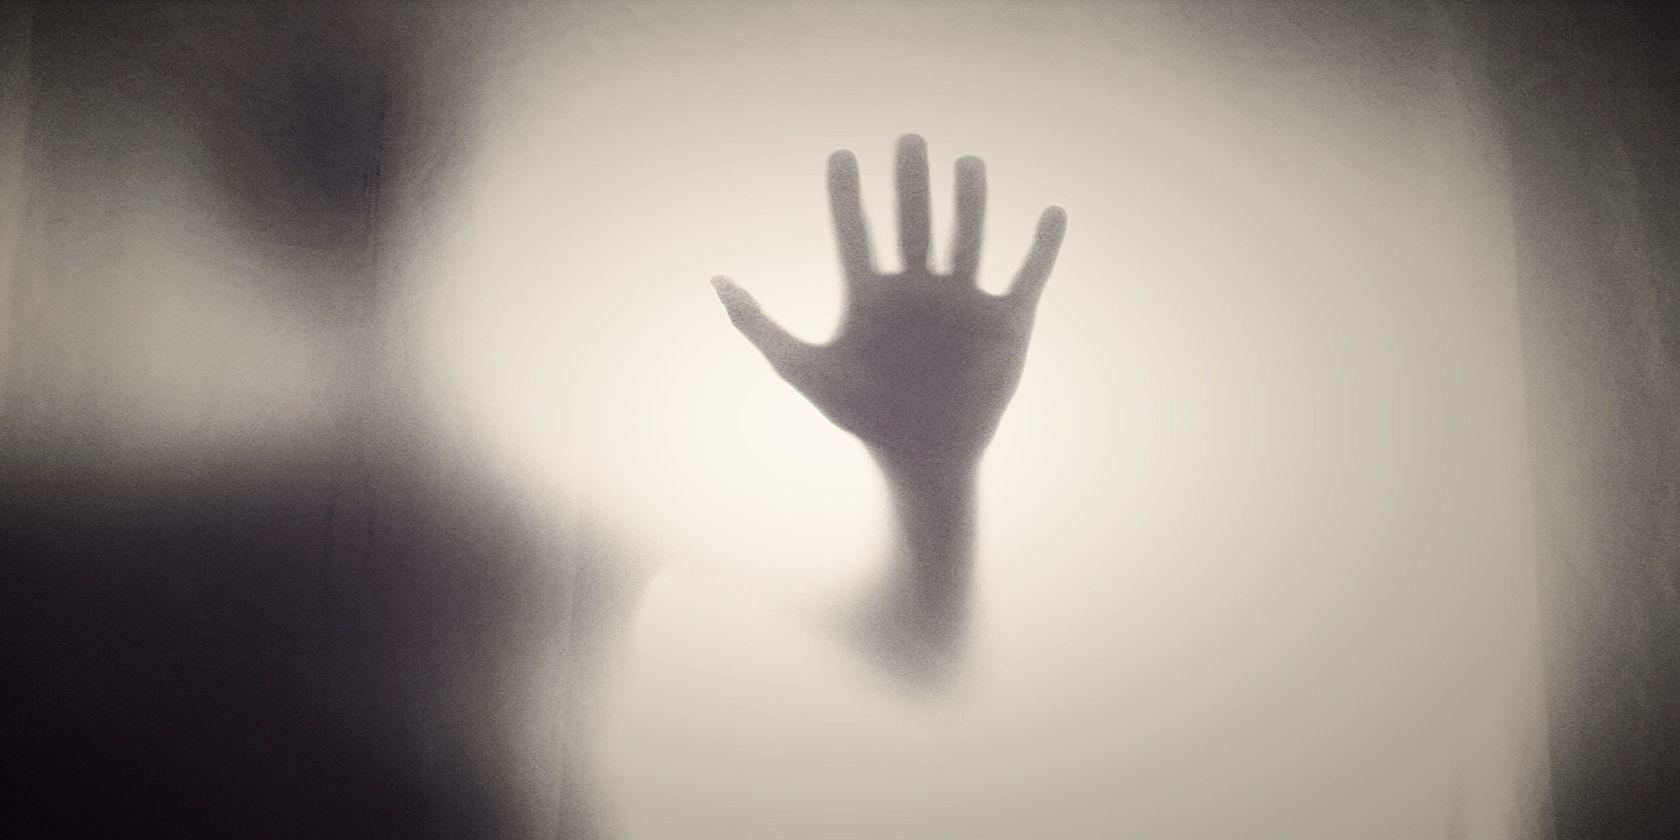 Shudder vs. Screambox: What's the Best Horror Streaming Service?